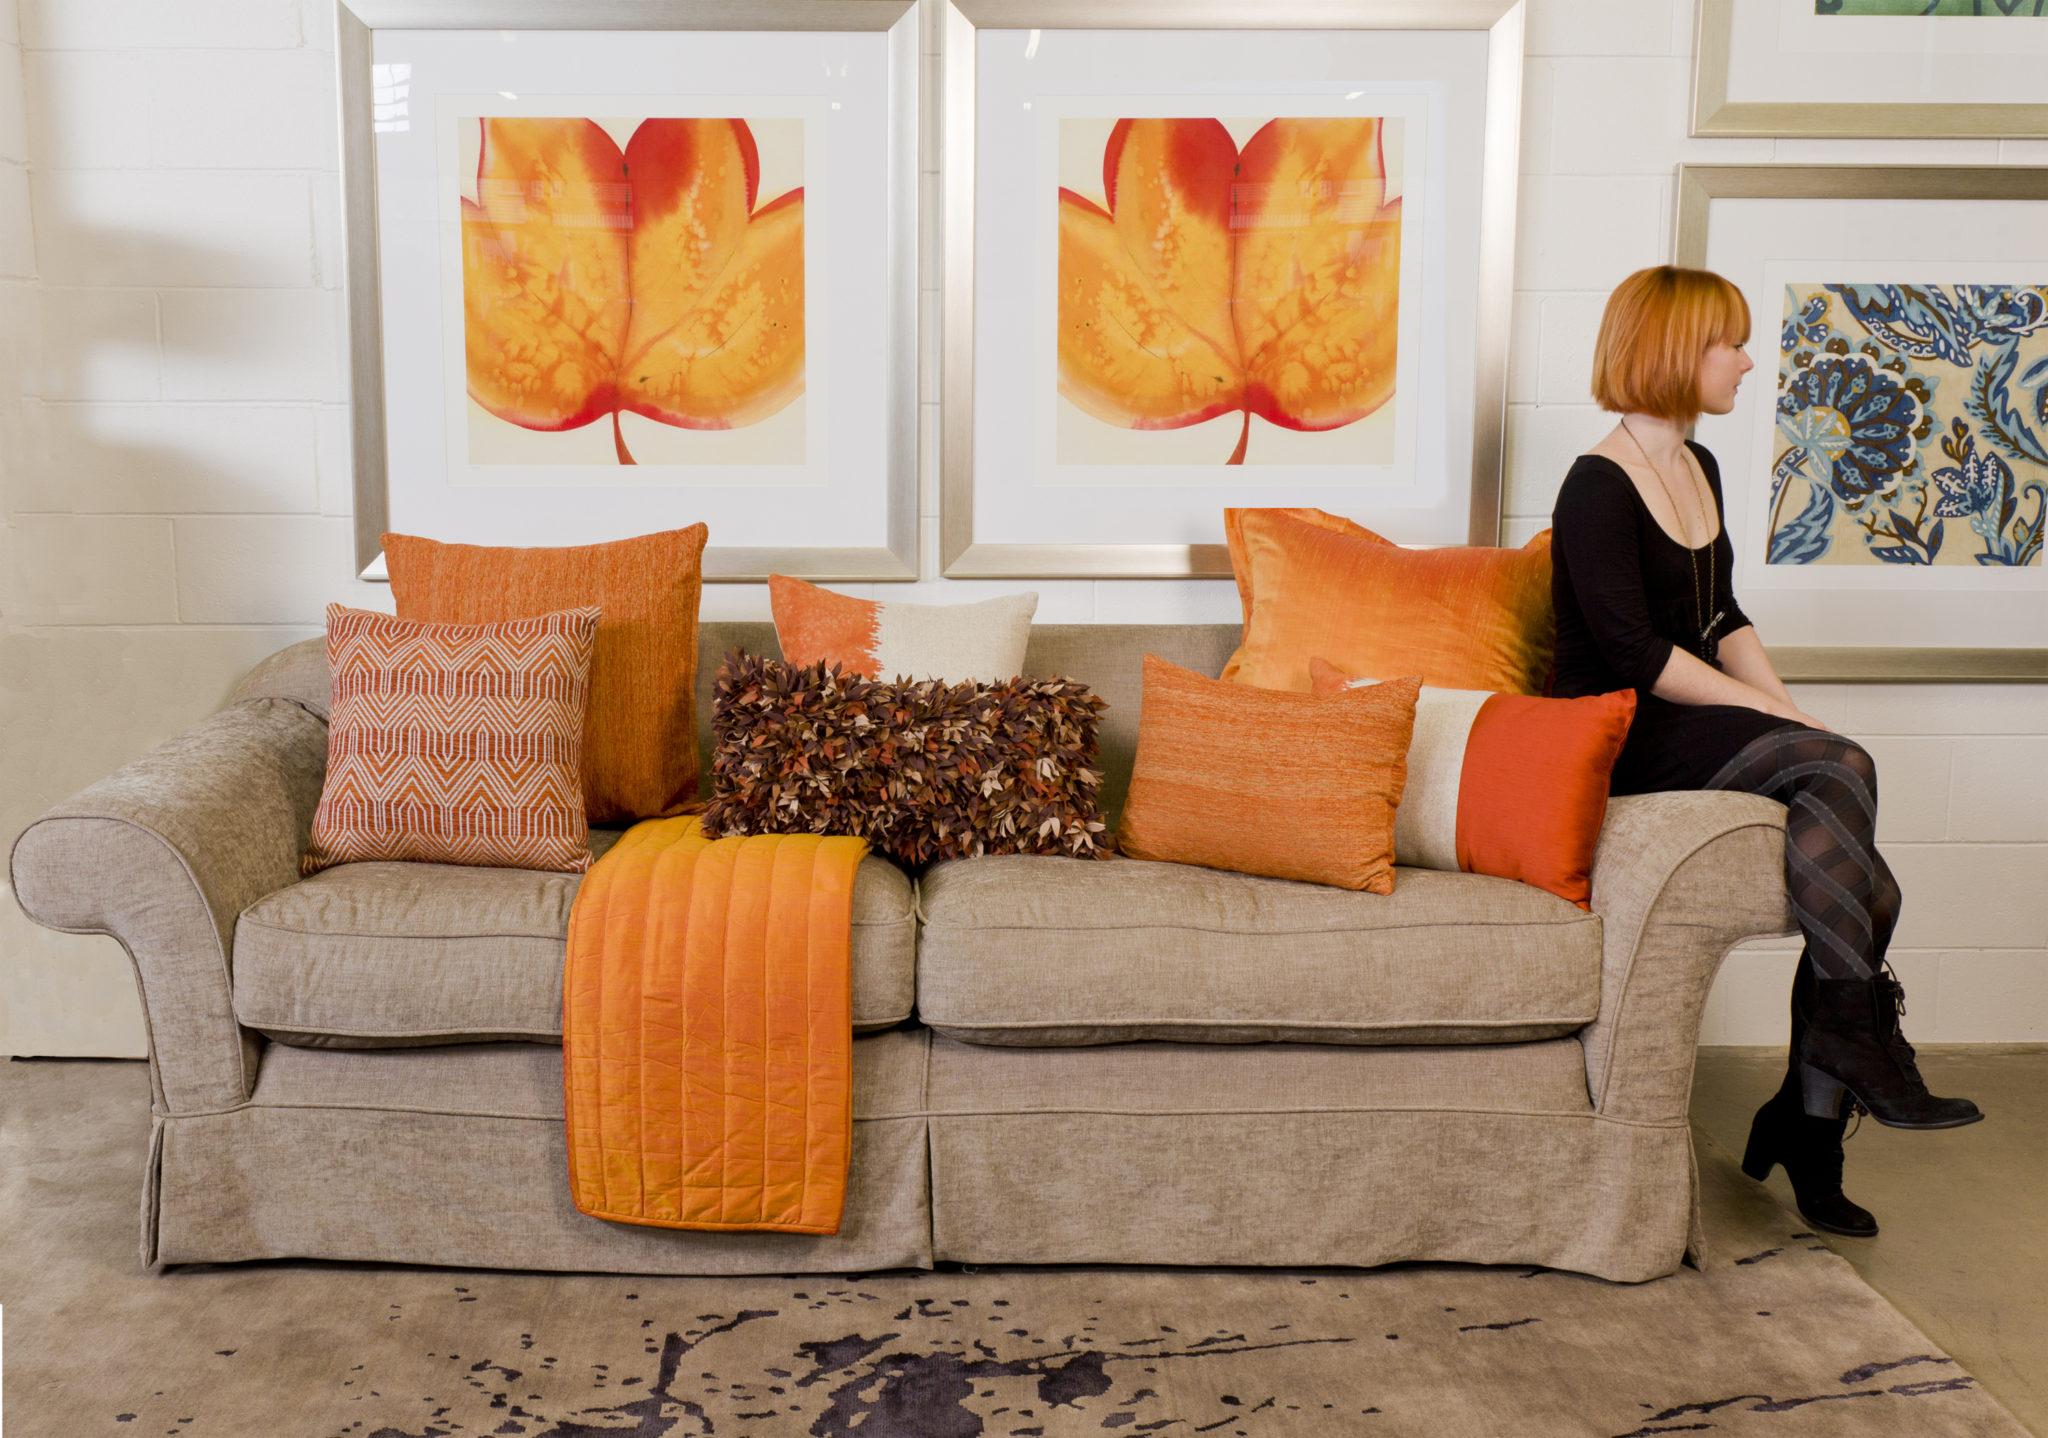 Interior Designer At Brisbanes Highgate House Briana Hayes